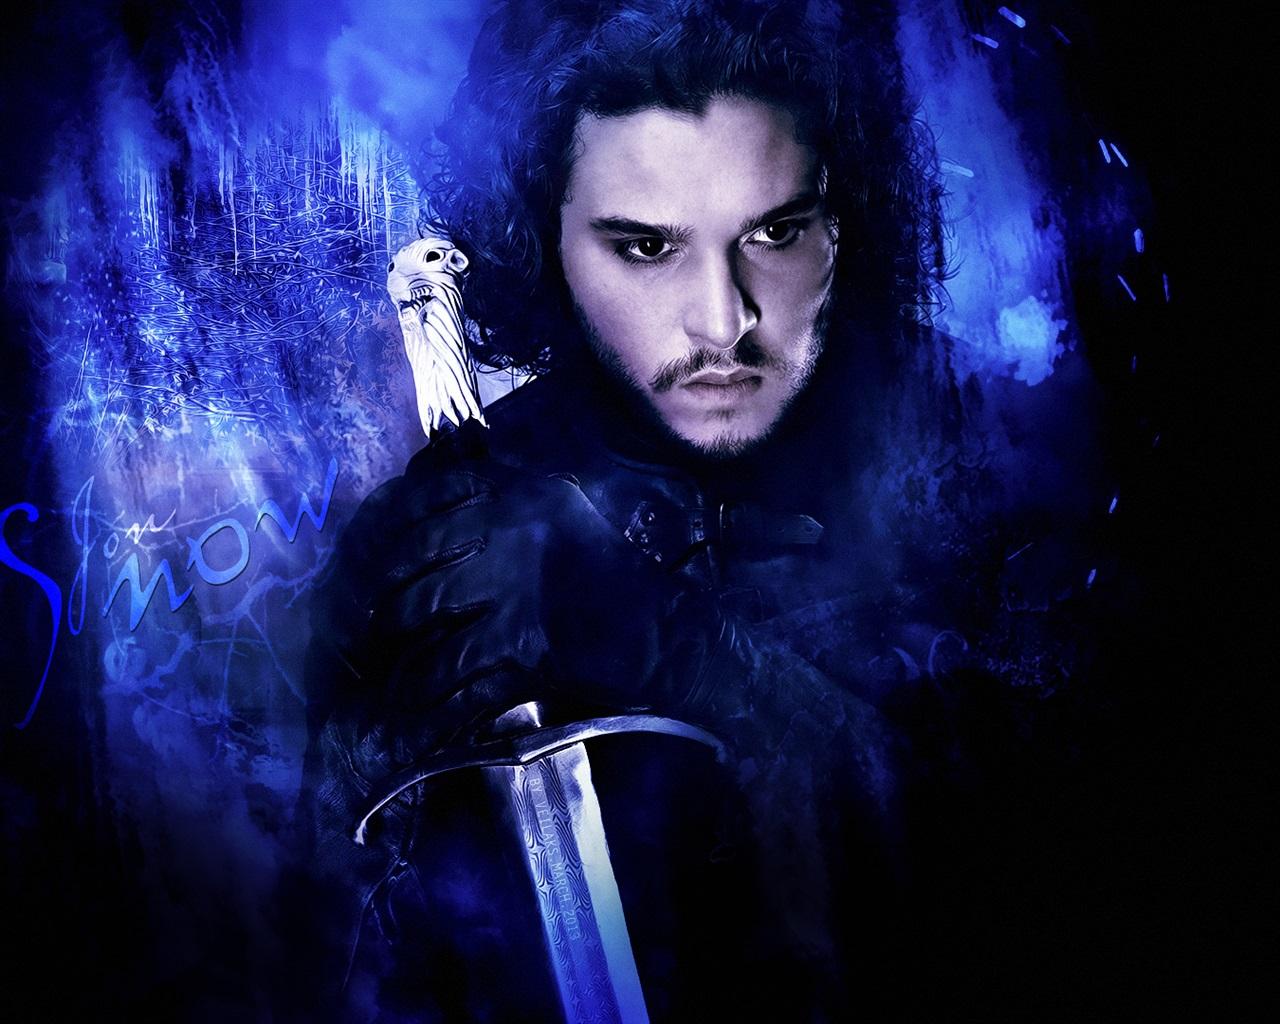 Wallpaper Game Of Thrones Jon Snow 1920x1080 Full Hd 2k Picture